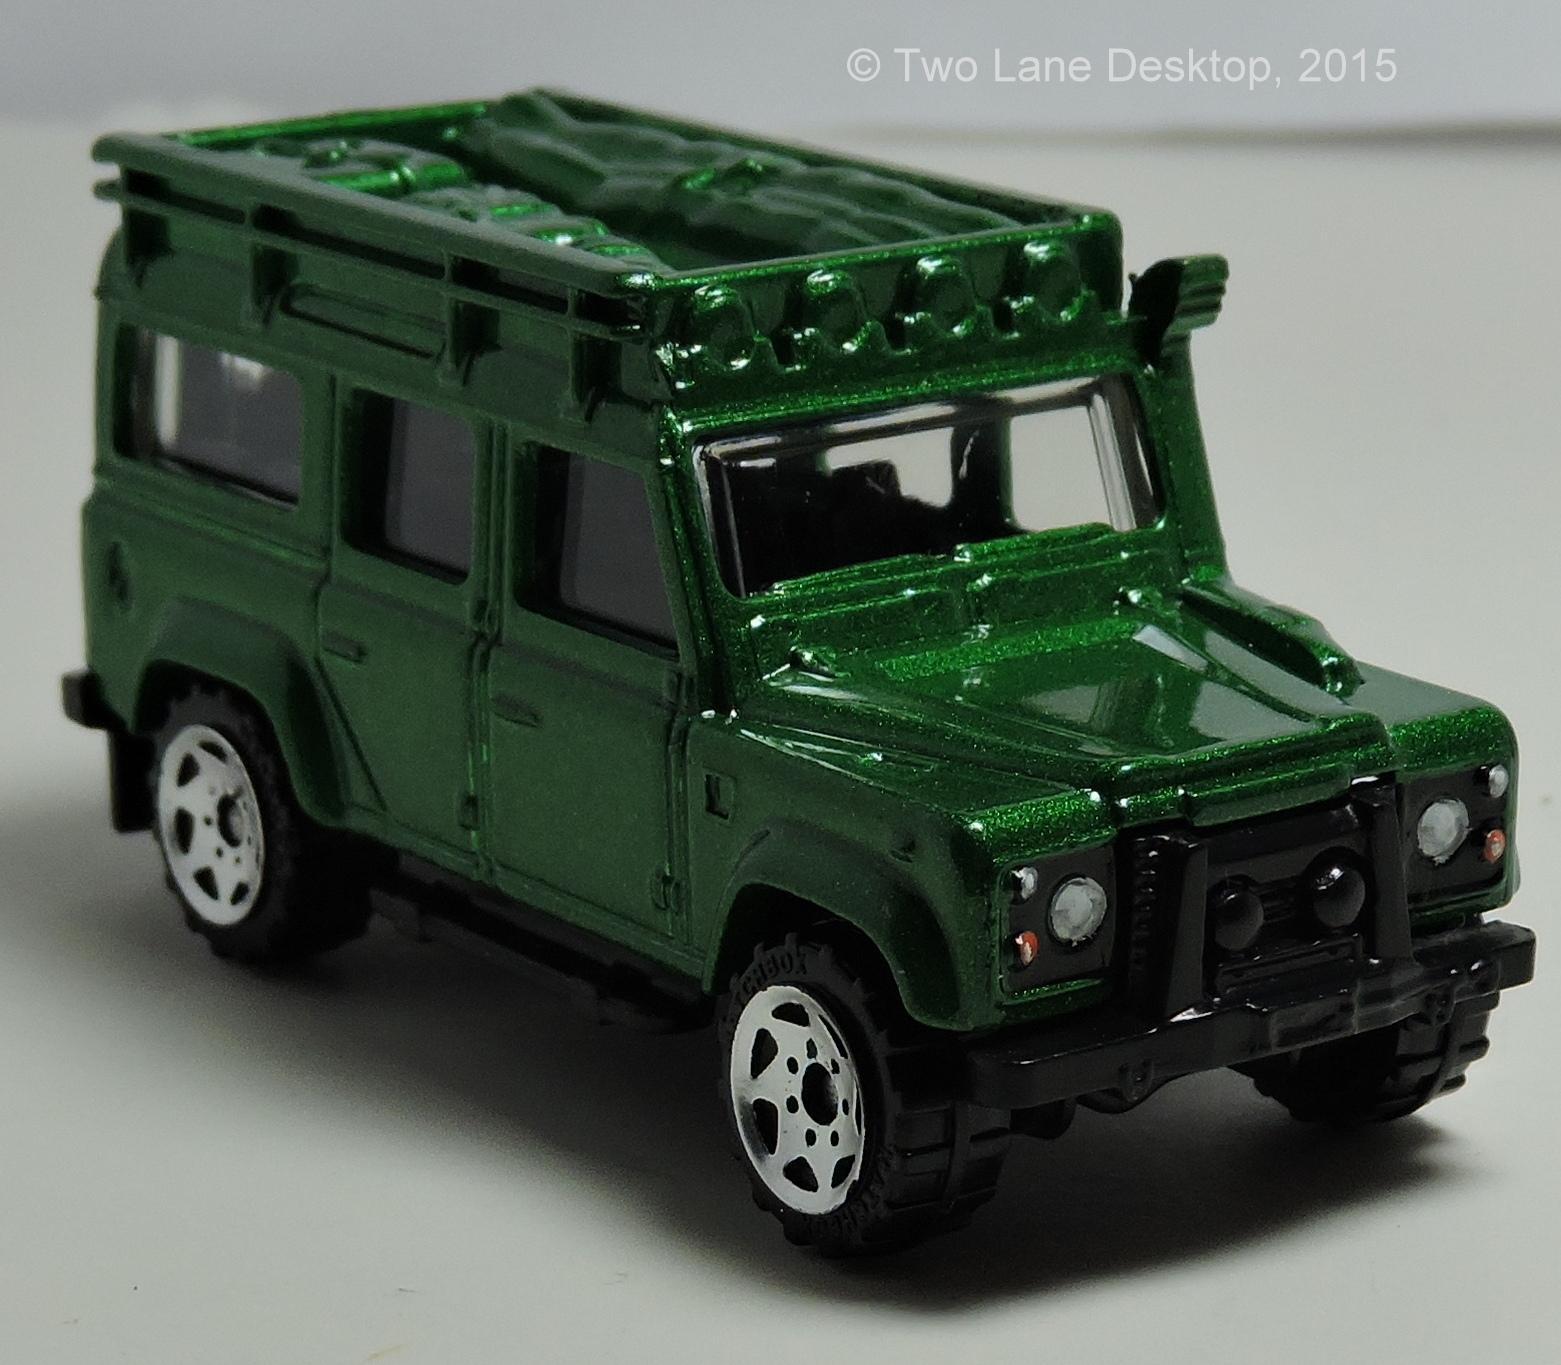 Land Rover: Two Lane Desktop: RMZ City 1:40 And Matchbox 1:64 Land